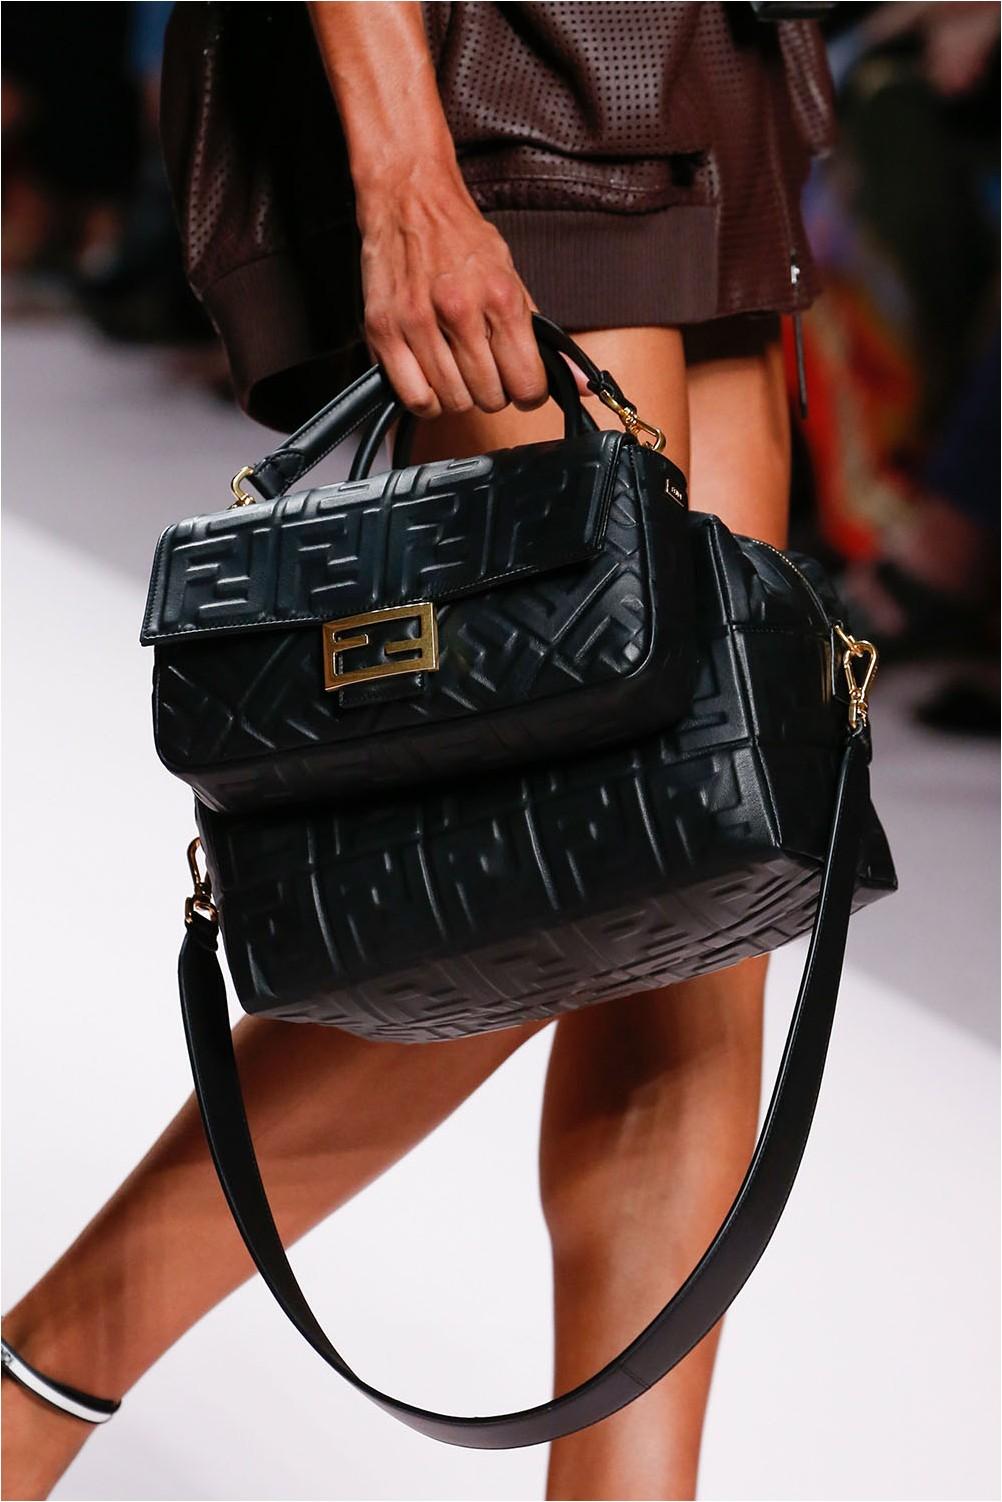 Fendi Handbag Set